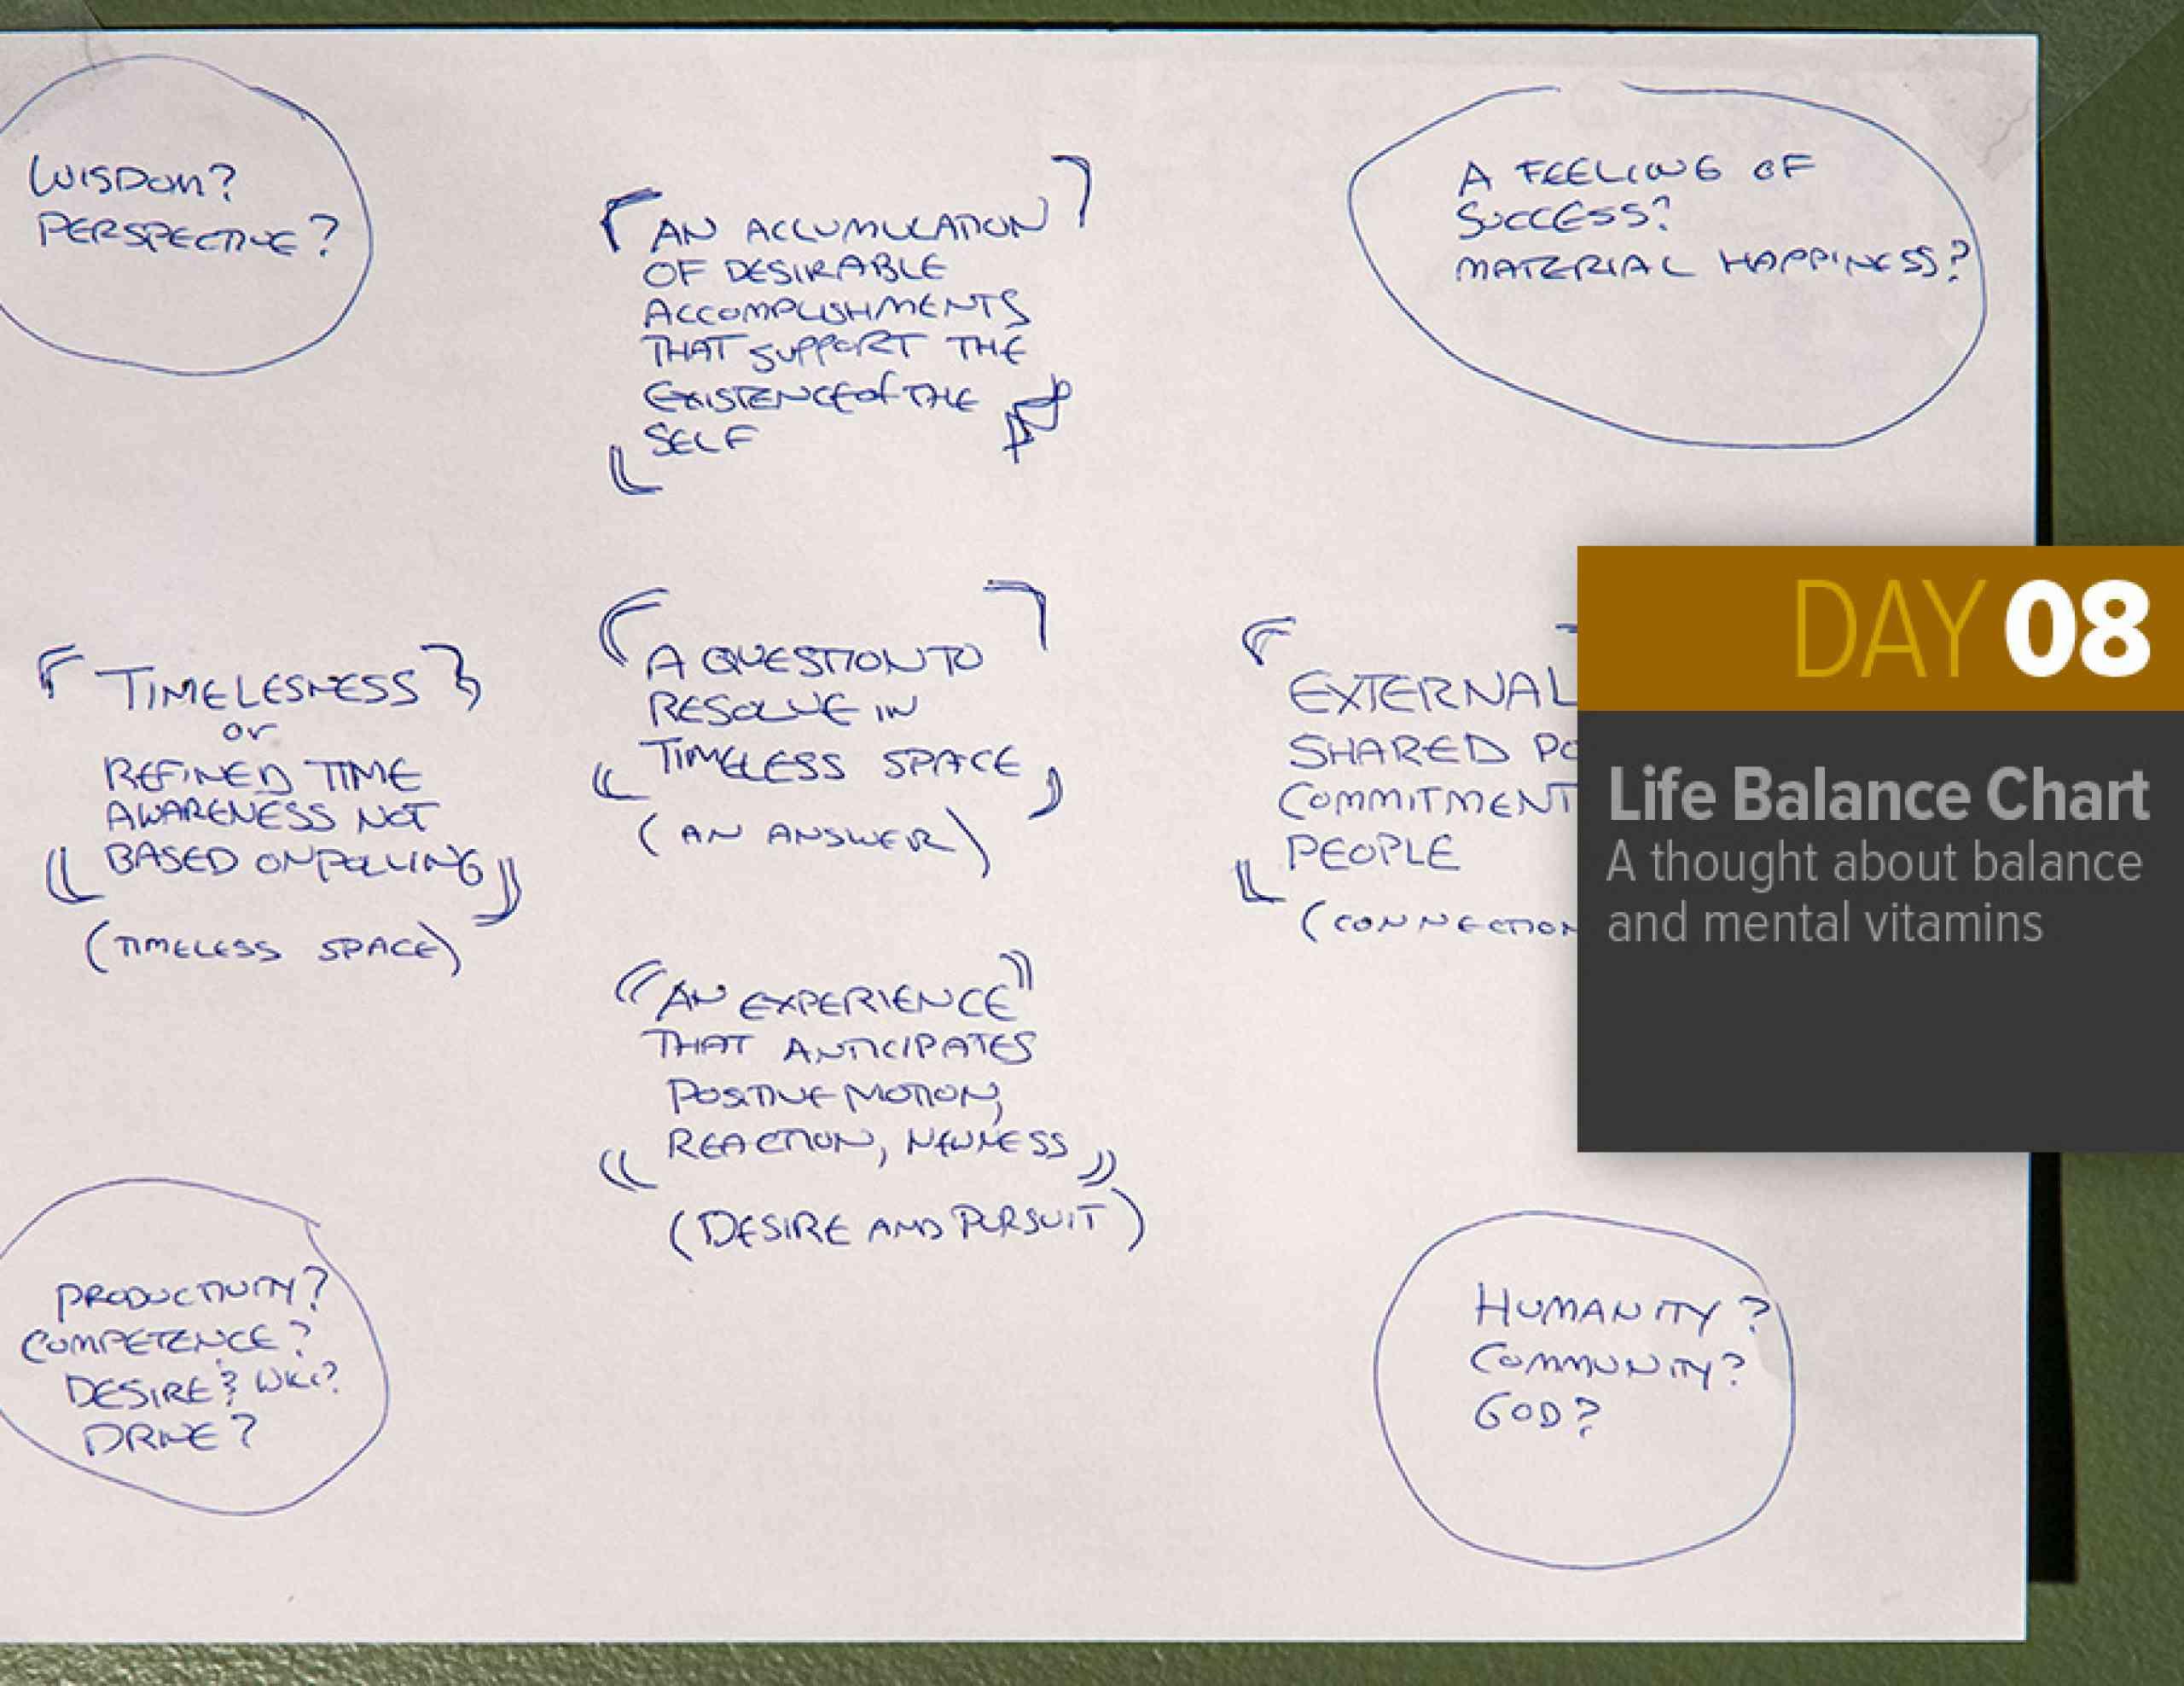 LifeBalanceRoughDiagram